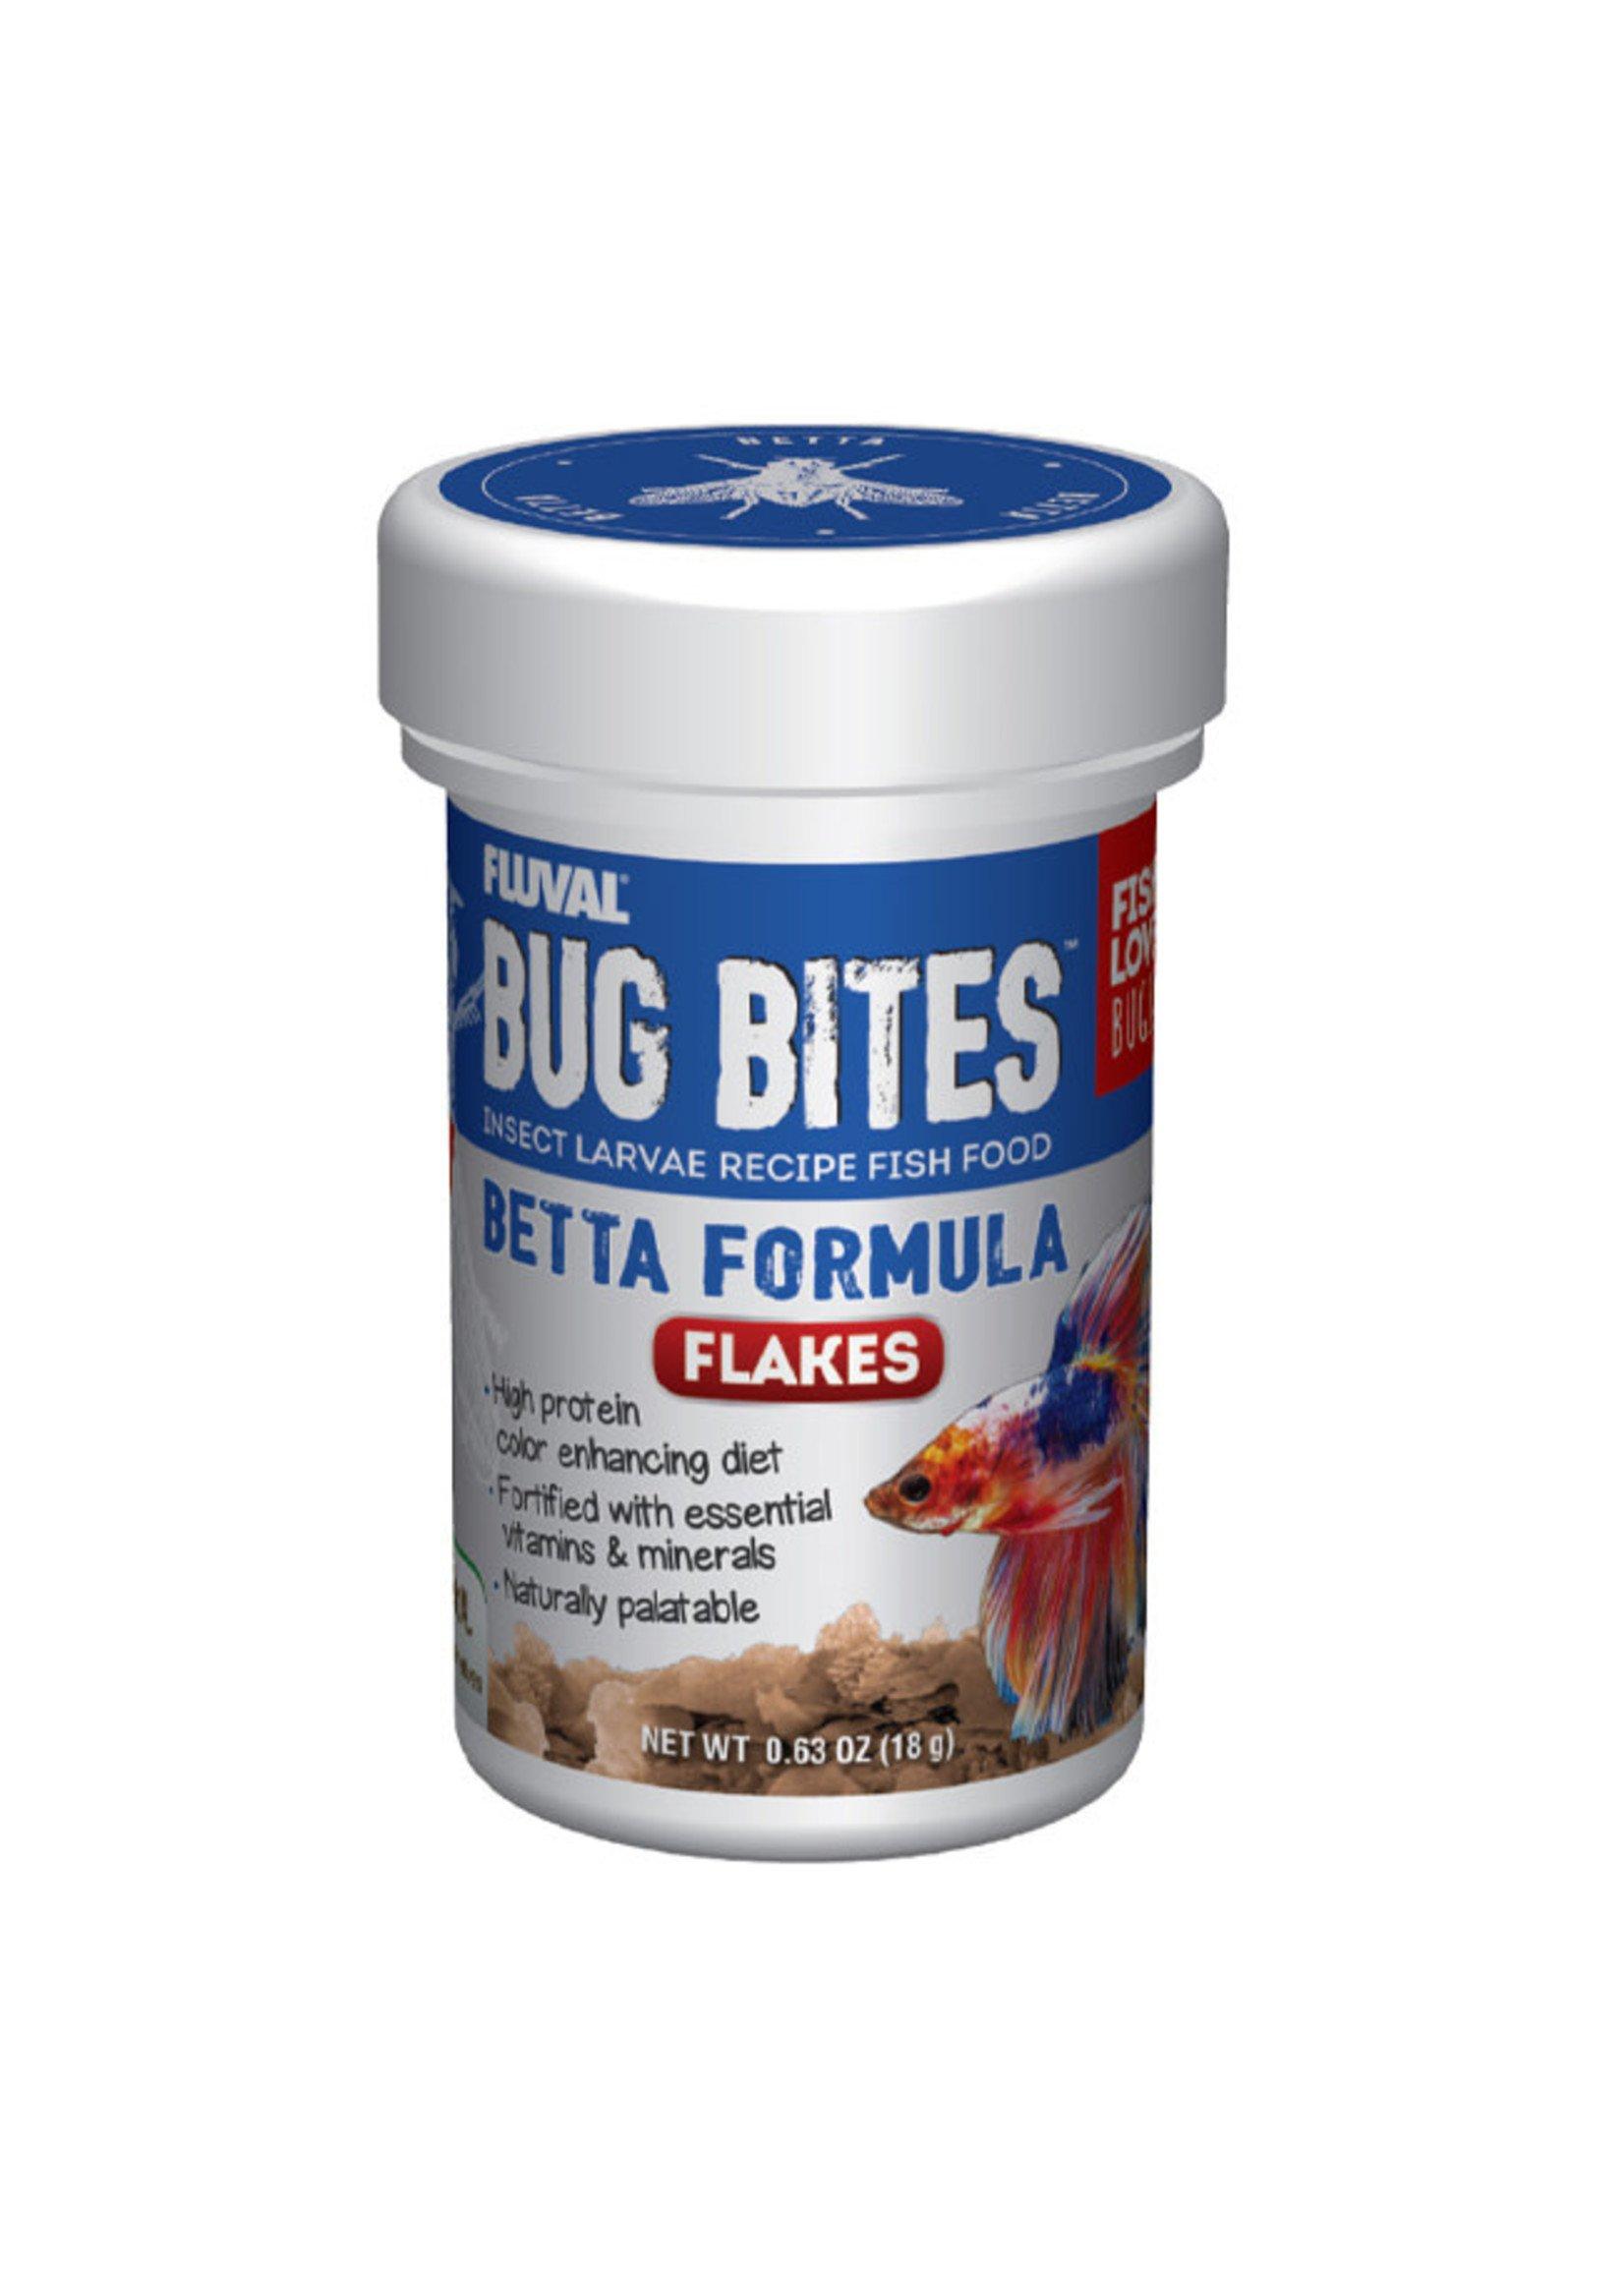 Fluval Fluval Bug Bites Betta Flakes 18g / .63oz